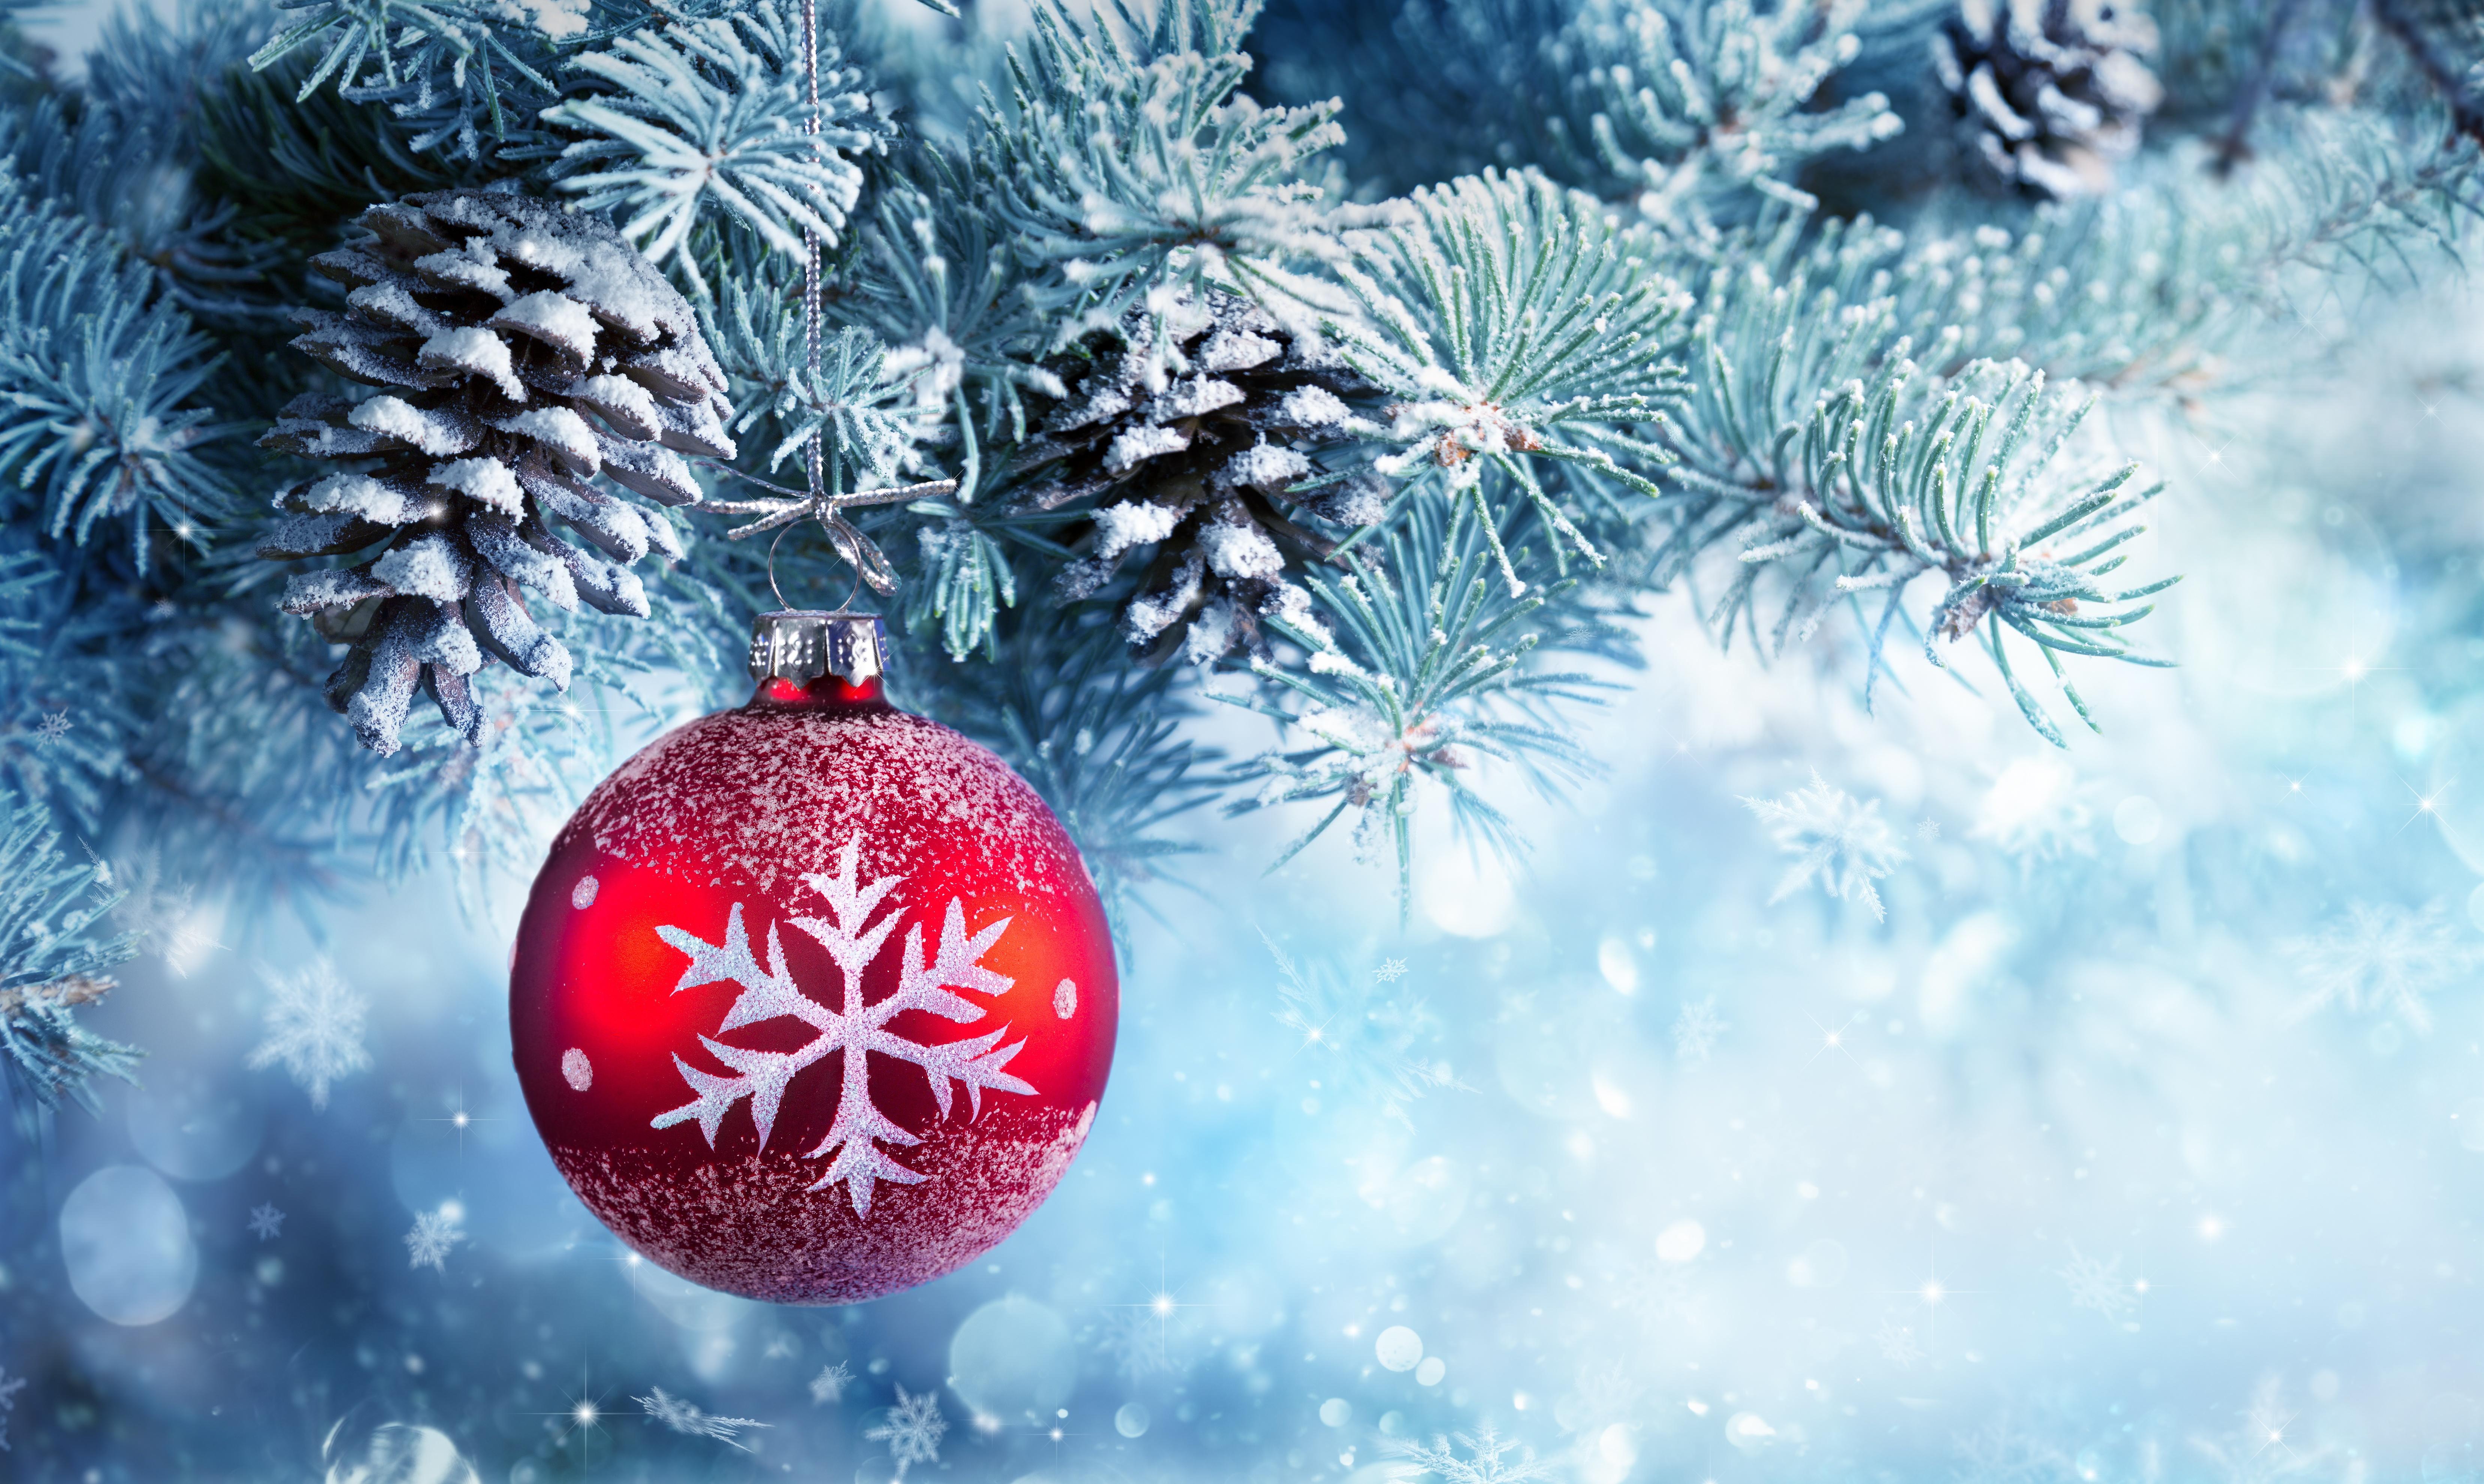 Wallpaper Christmas ball, Christmas ornament, Winter, Pine